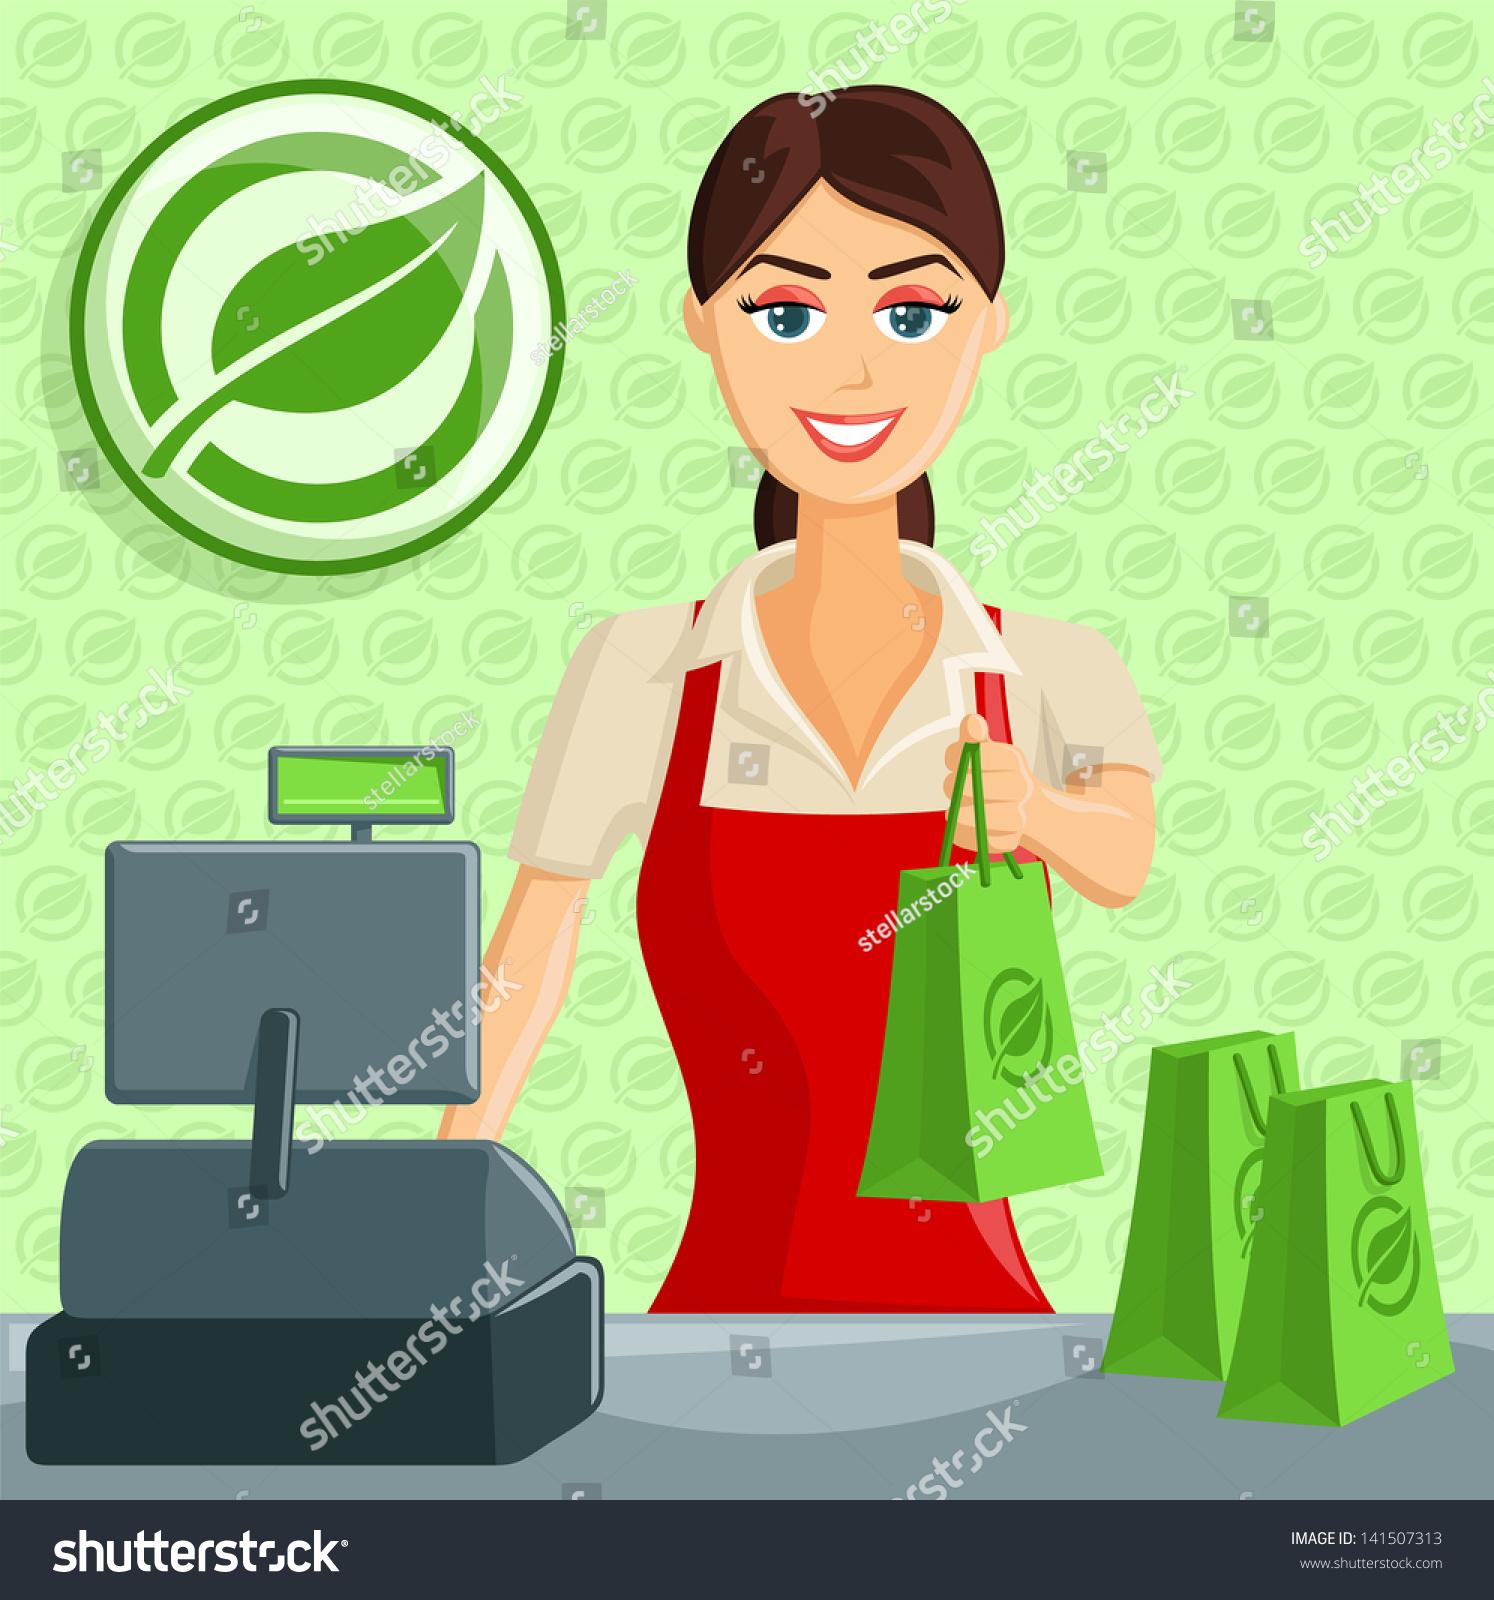 Cashier Cartoons: Smiling Supermarket Eco Green Store Cashier Stock Vector